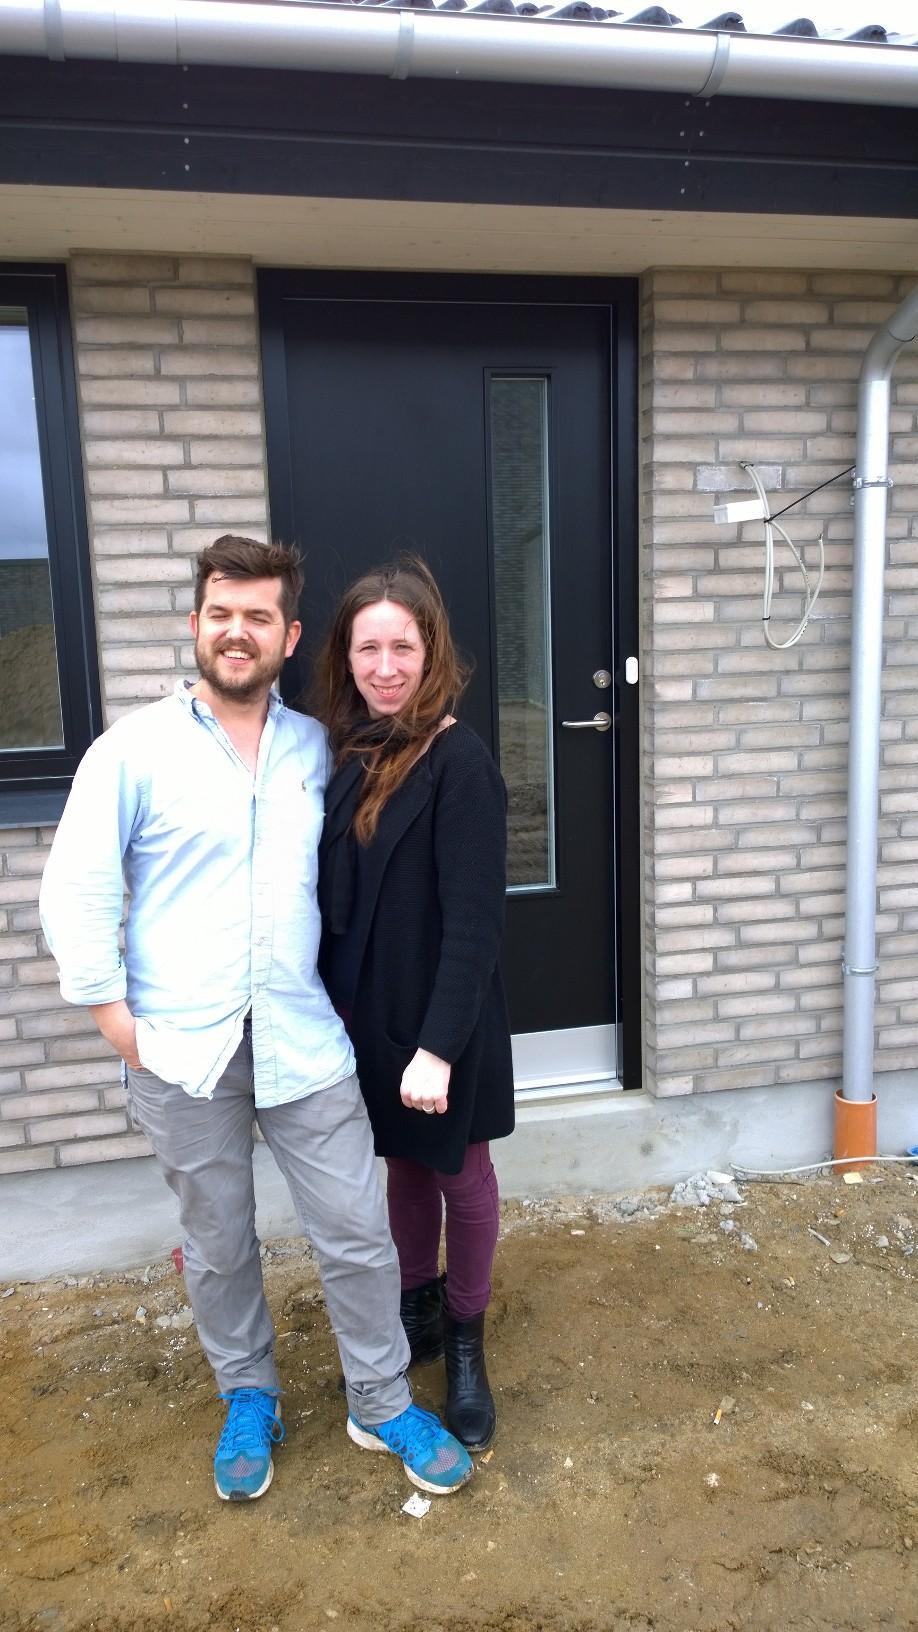 Benée huse a/s   entreprenør, tilbygning, totalentrepriser   tilst